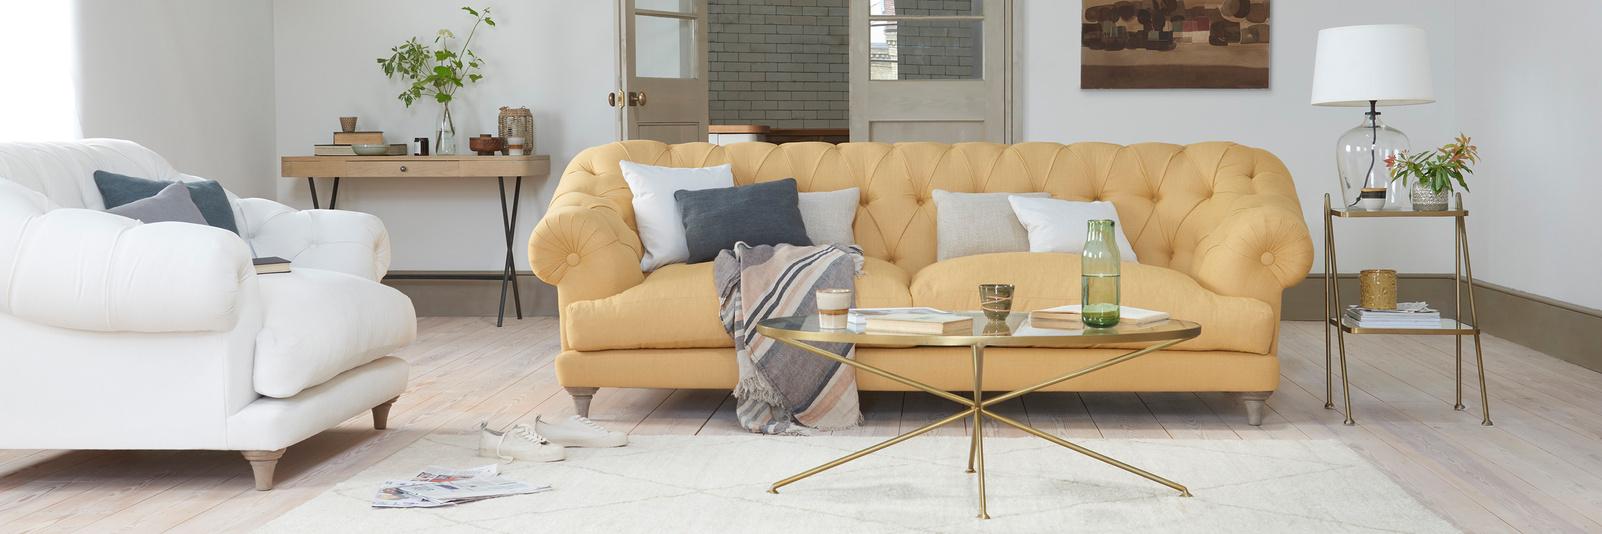 Bagsie Upholstered Button Back Sofa